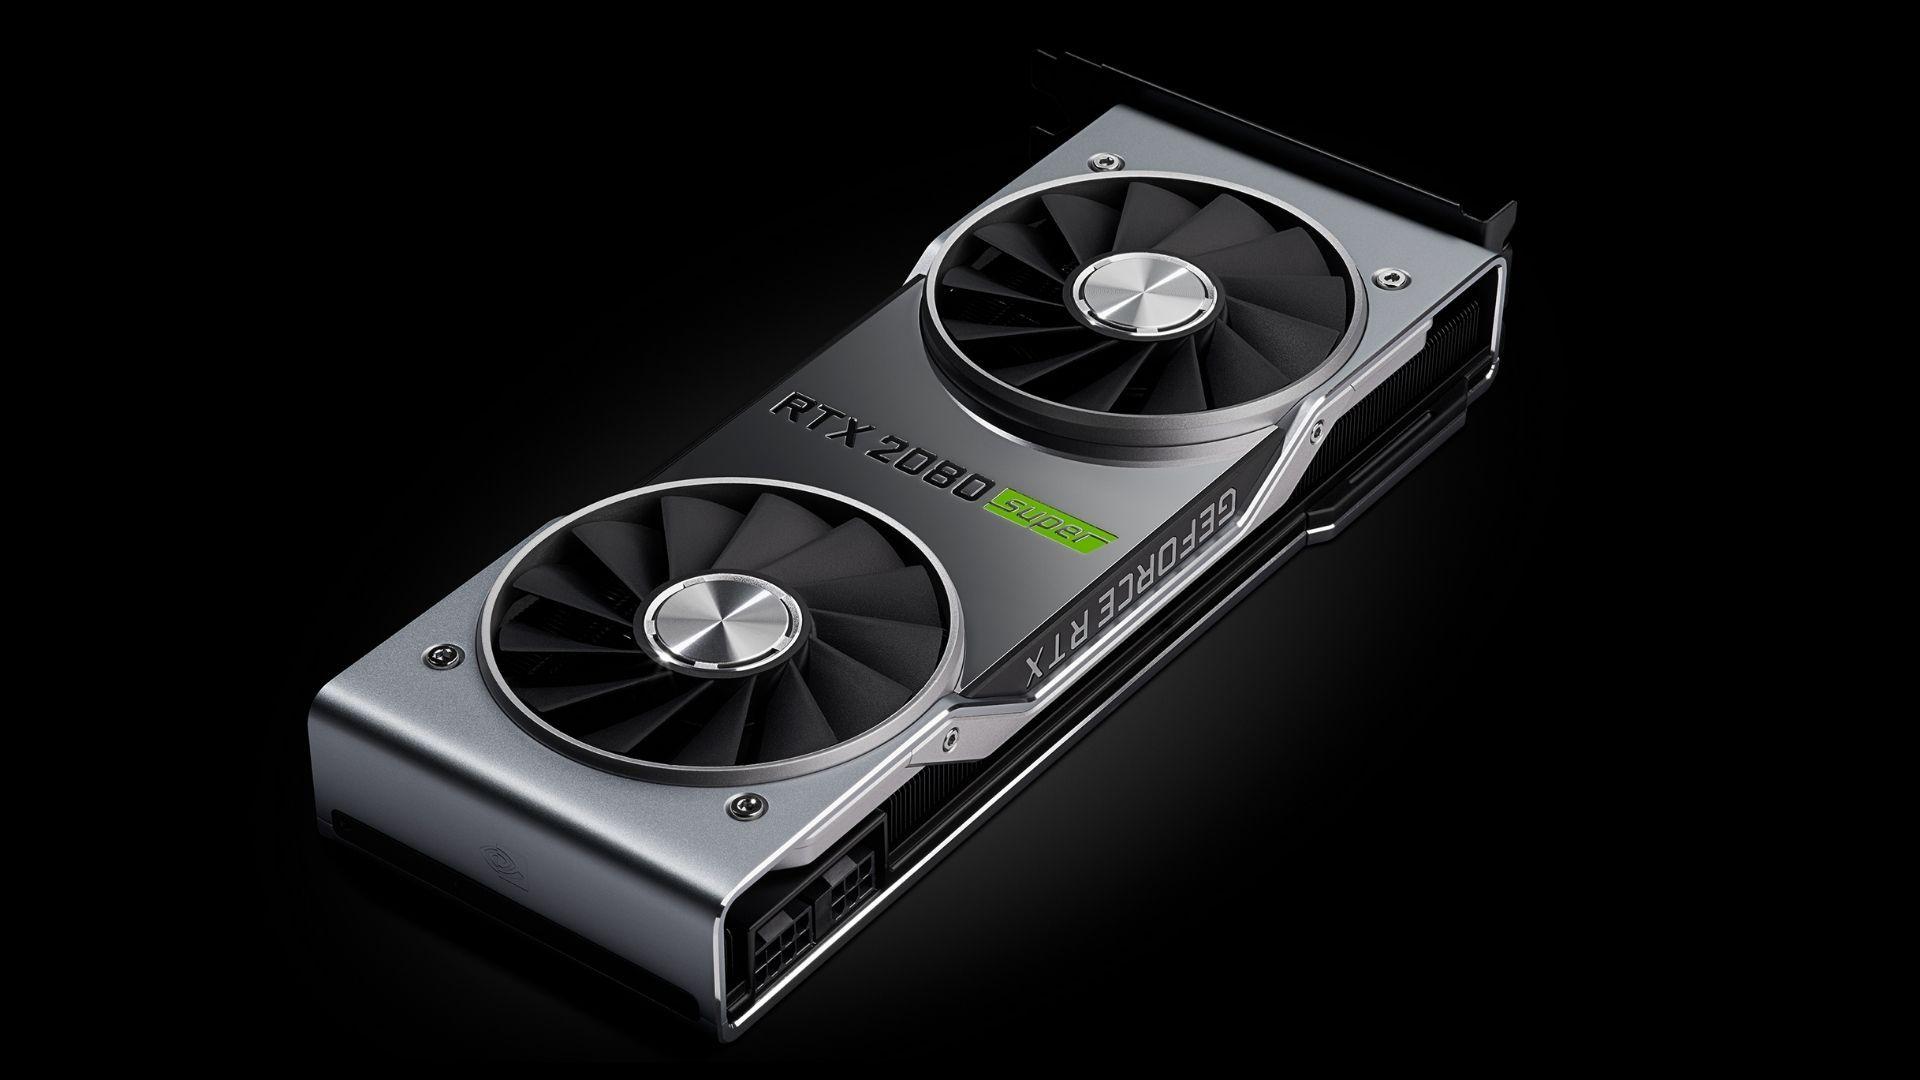 Placa de vídeo RTX 2080 Super no fundo preto